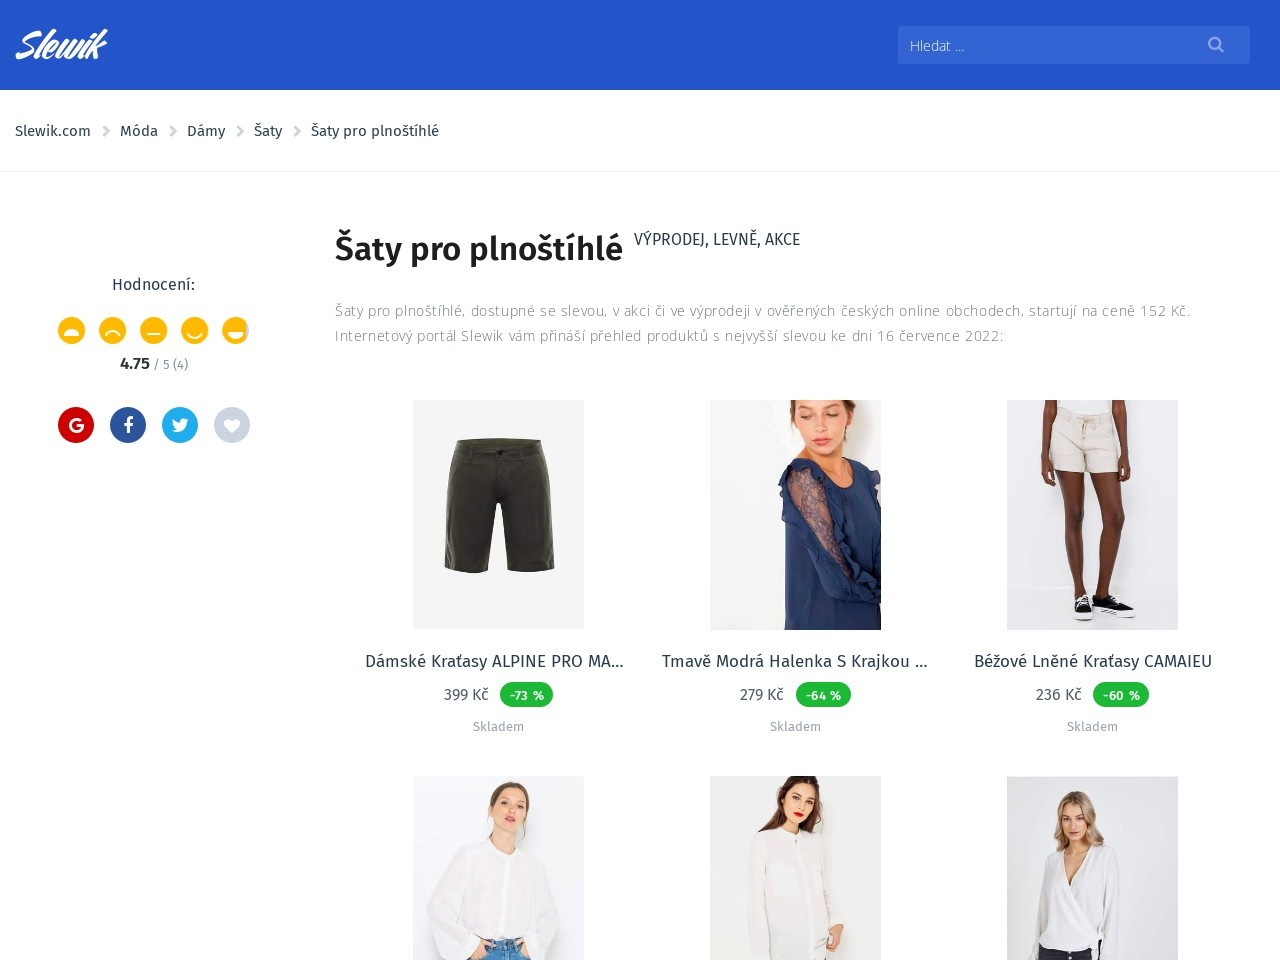 Šaty pro plnoštíhlé (Zdroj: Wordpress.com)